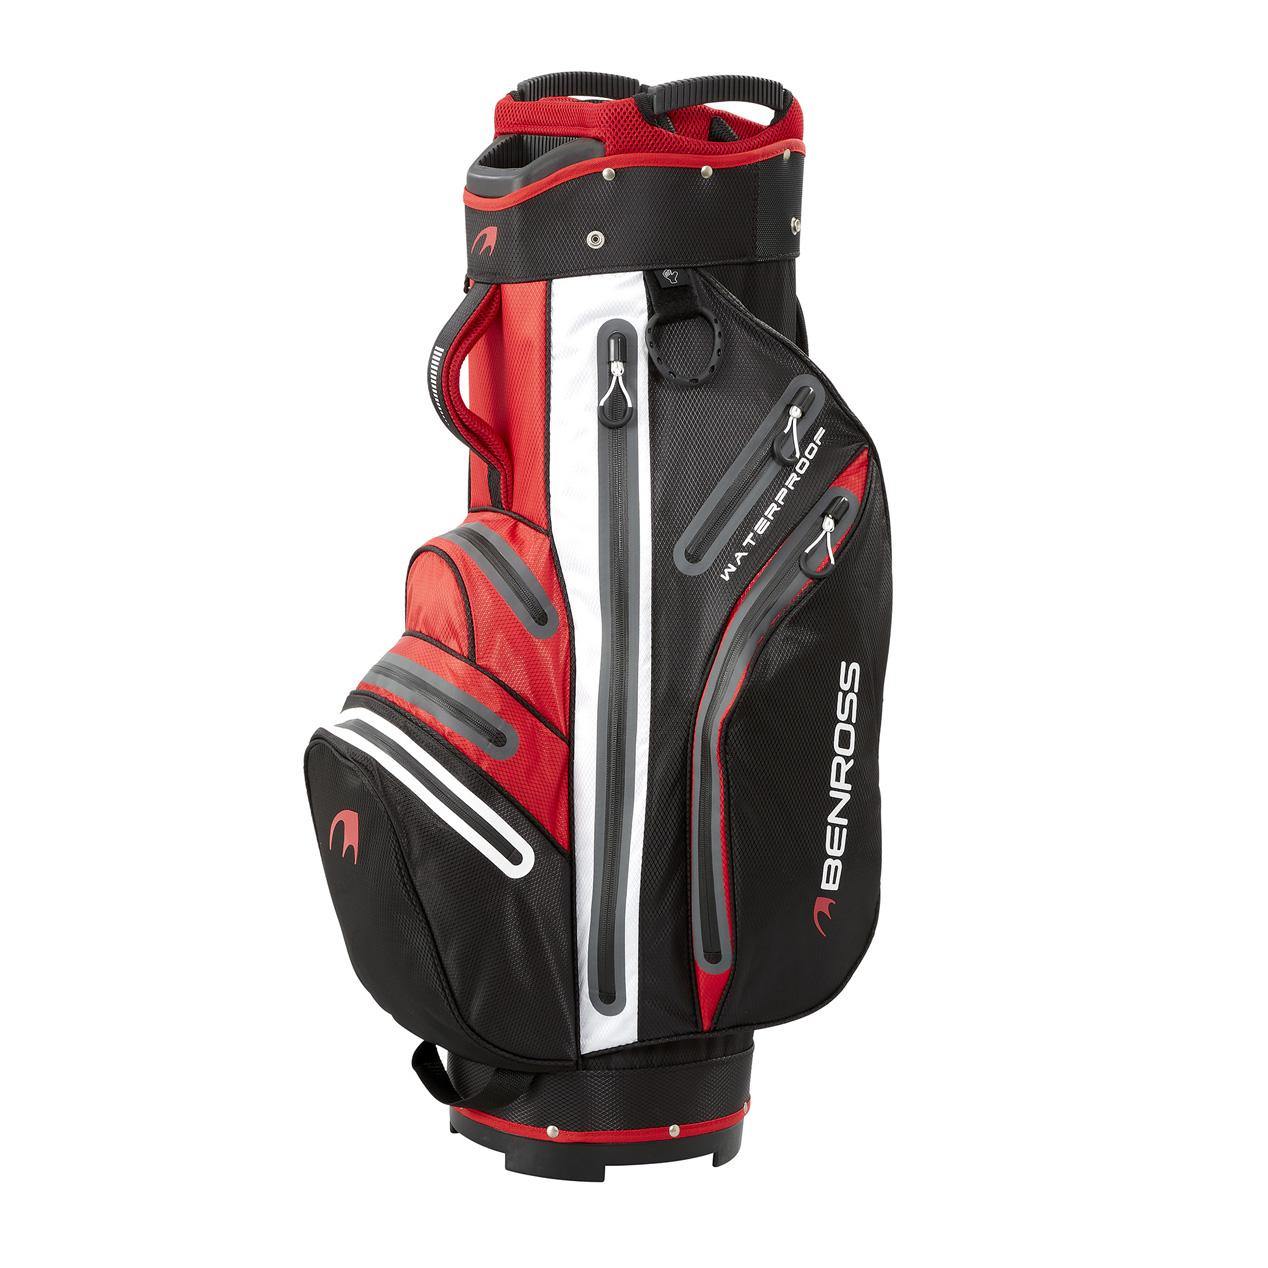 Protec Waterproof Cart Bag Benross Golf